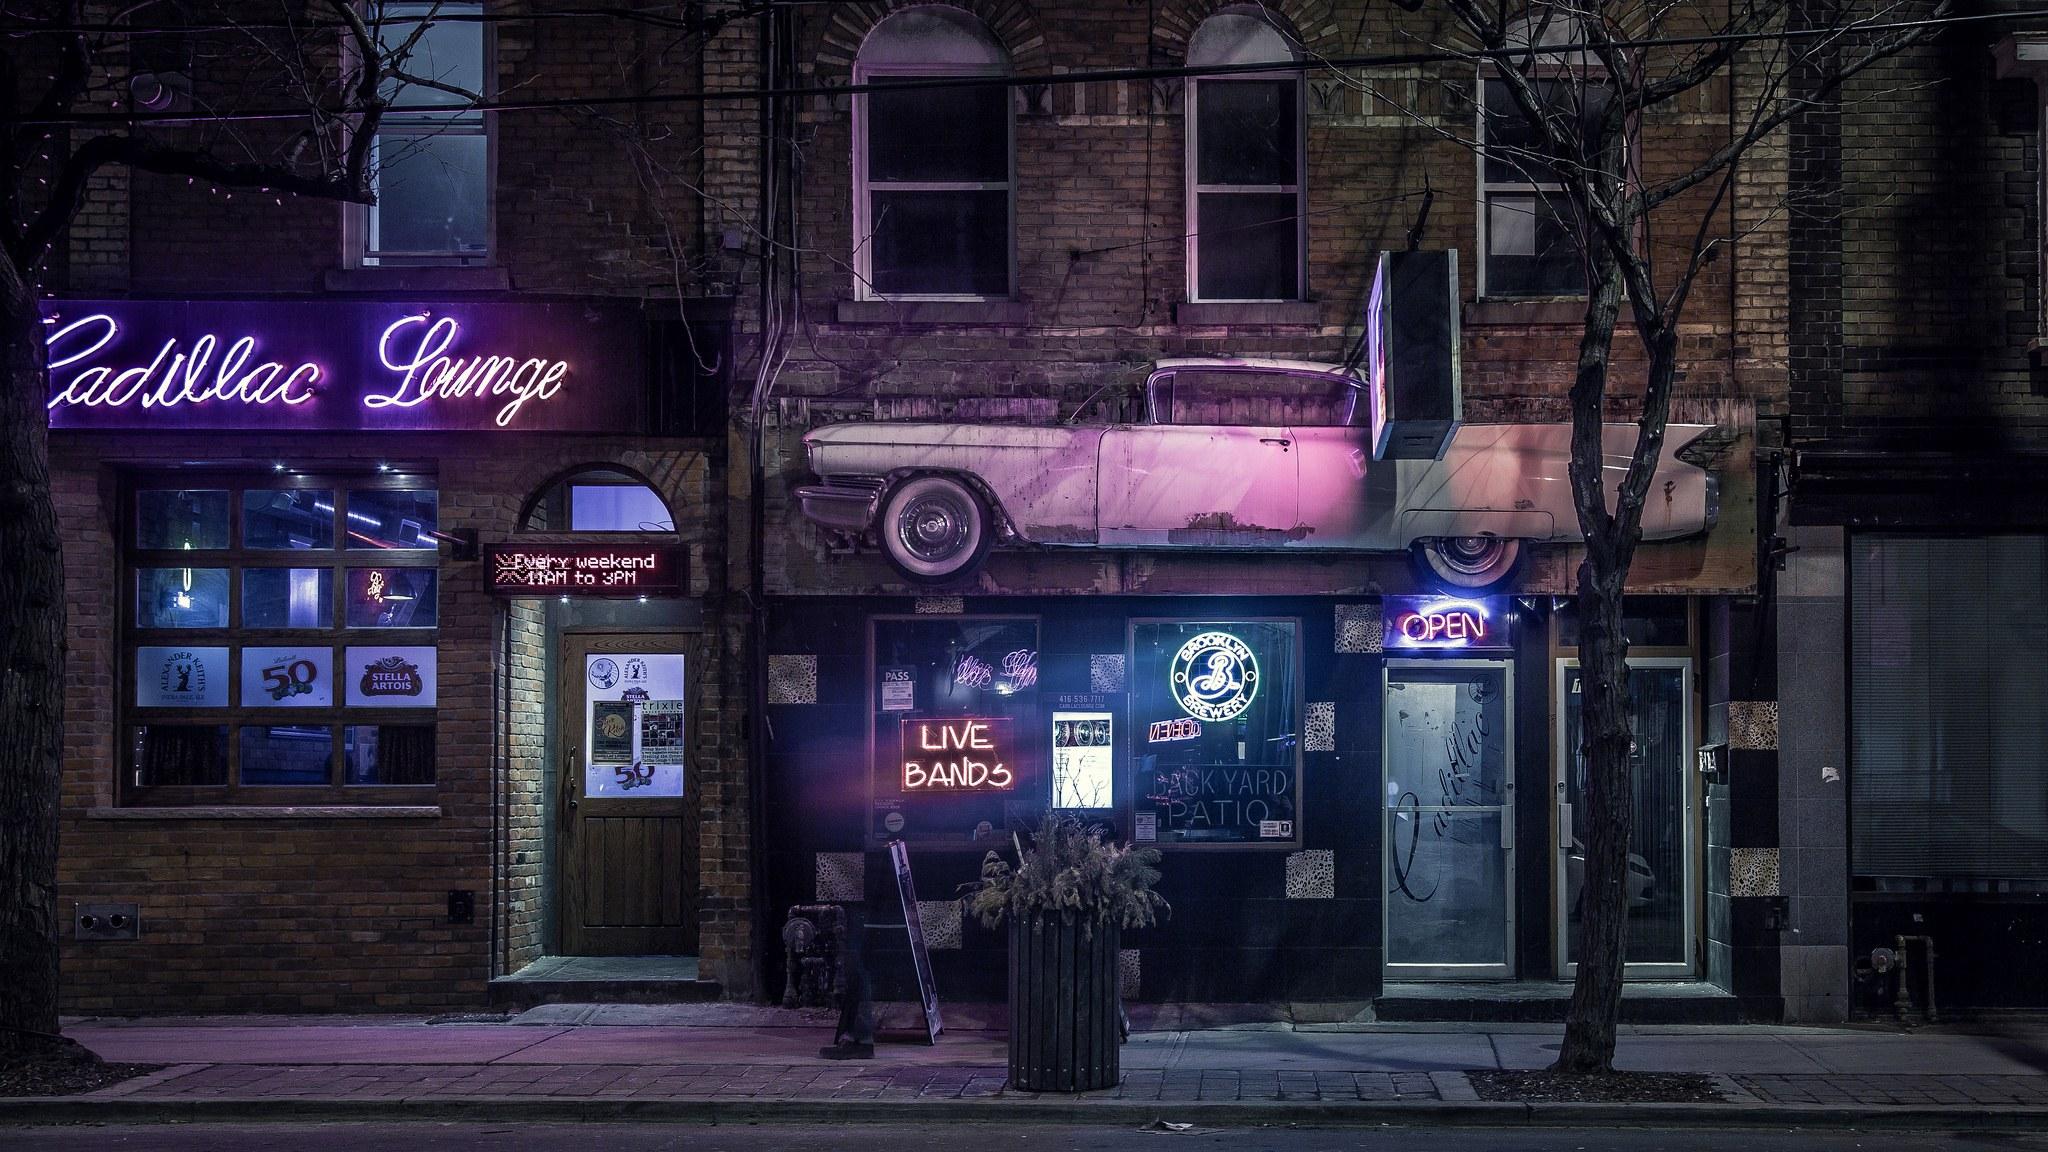 An entire Toronto neighbourhood just got free Wi-Fi for a year